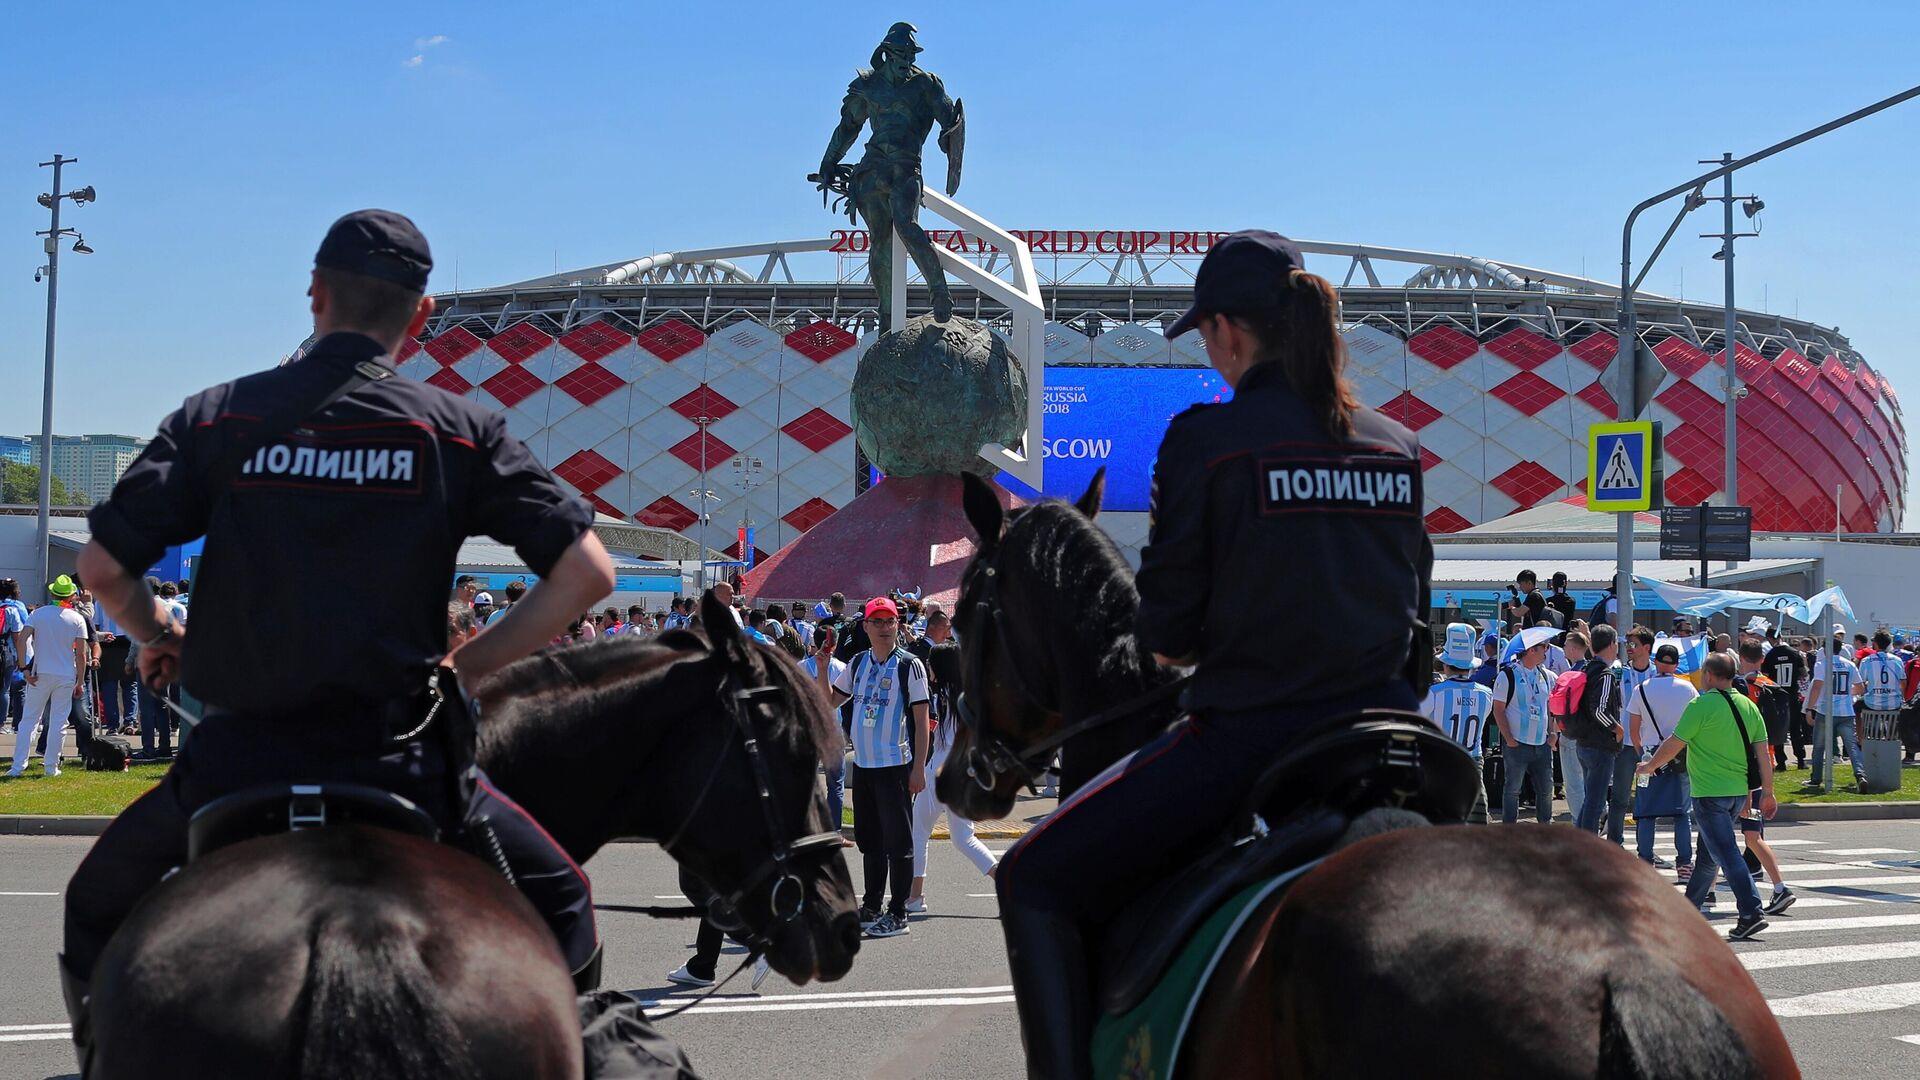 Полиция и стадион Открытие Арена - РИА Новости, 1920, 03.10.2020